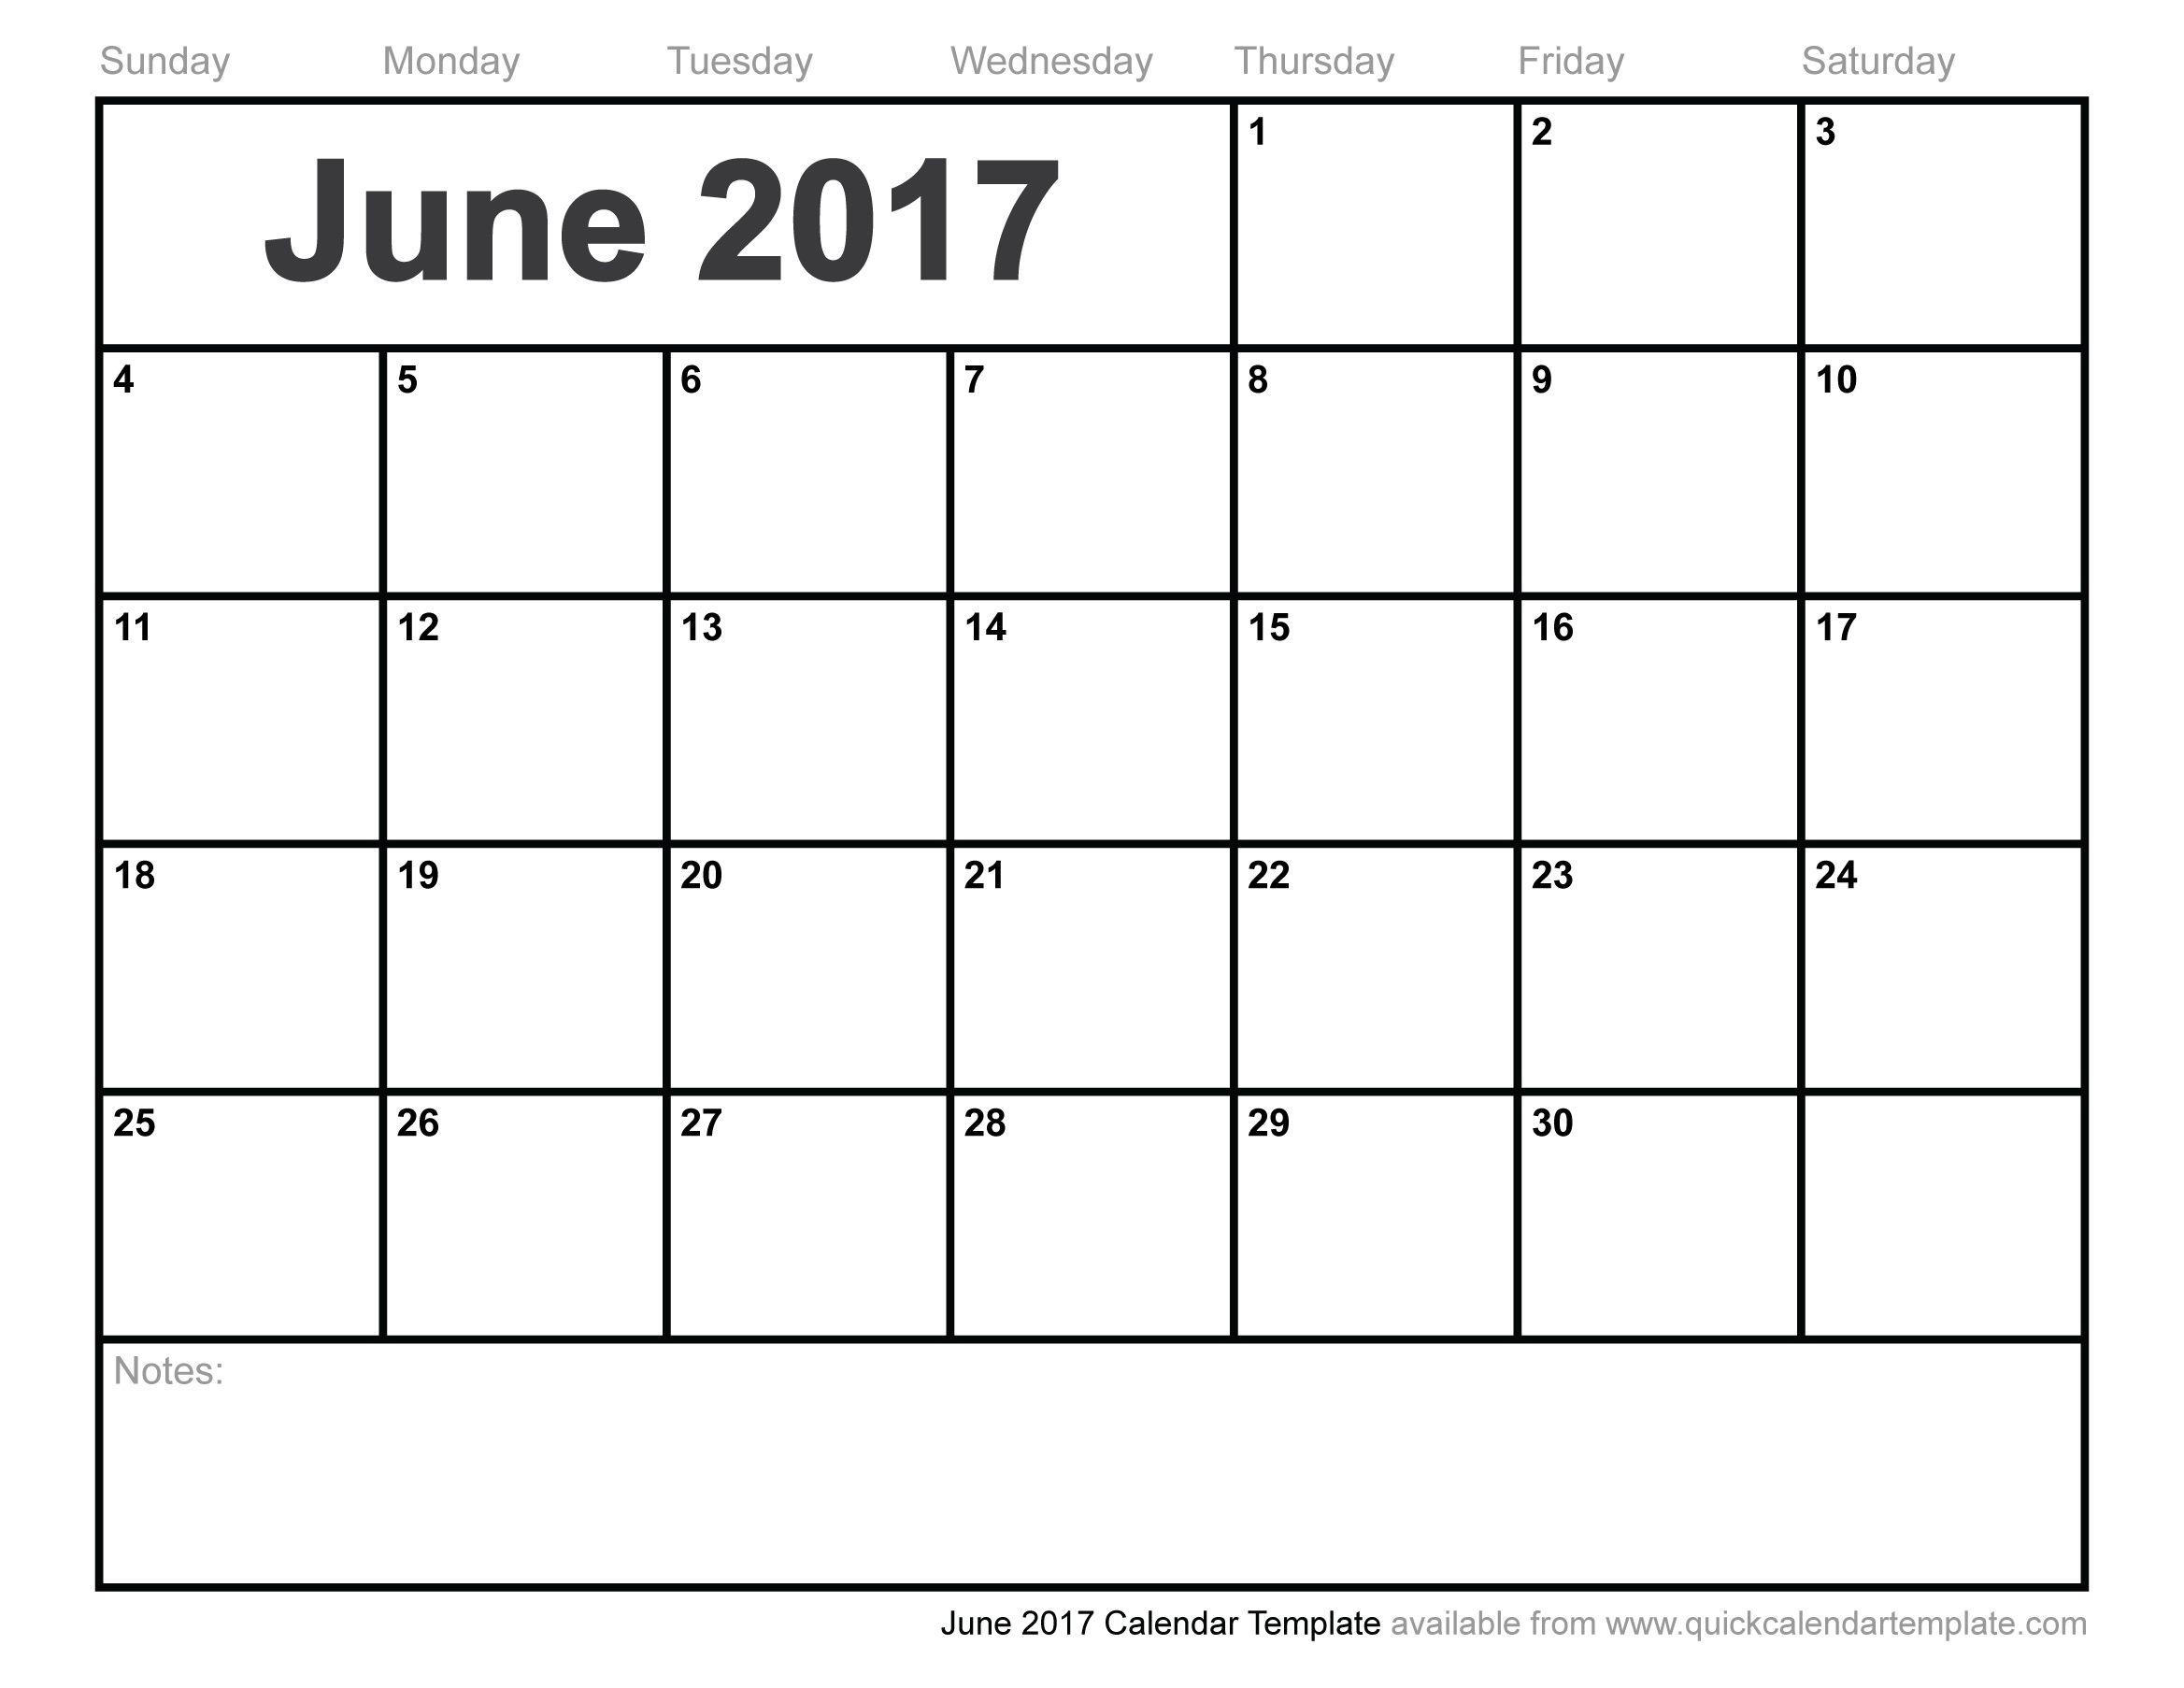 Blank Calendar Template 2017 June – Printable Editable Blank